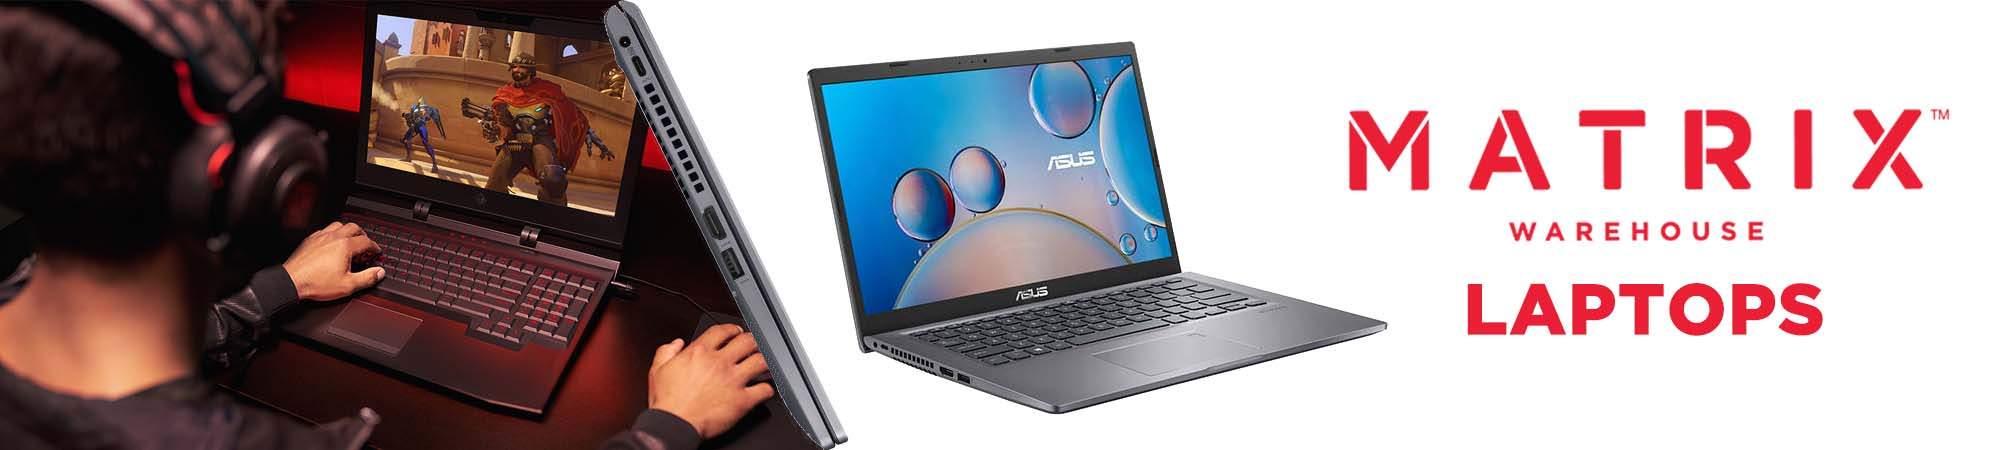 Laptops Page September 2021